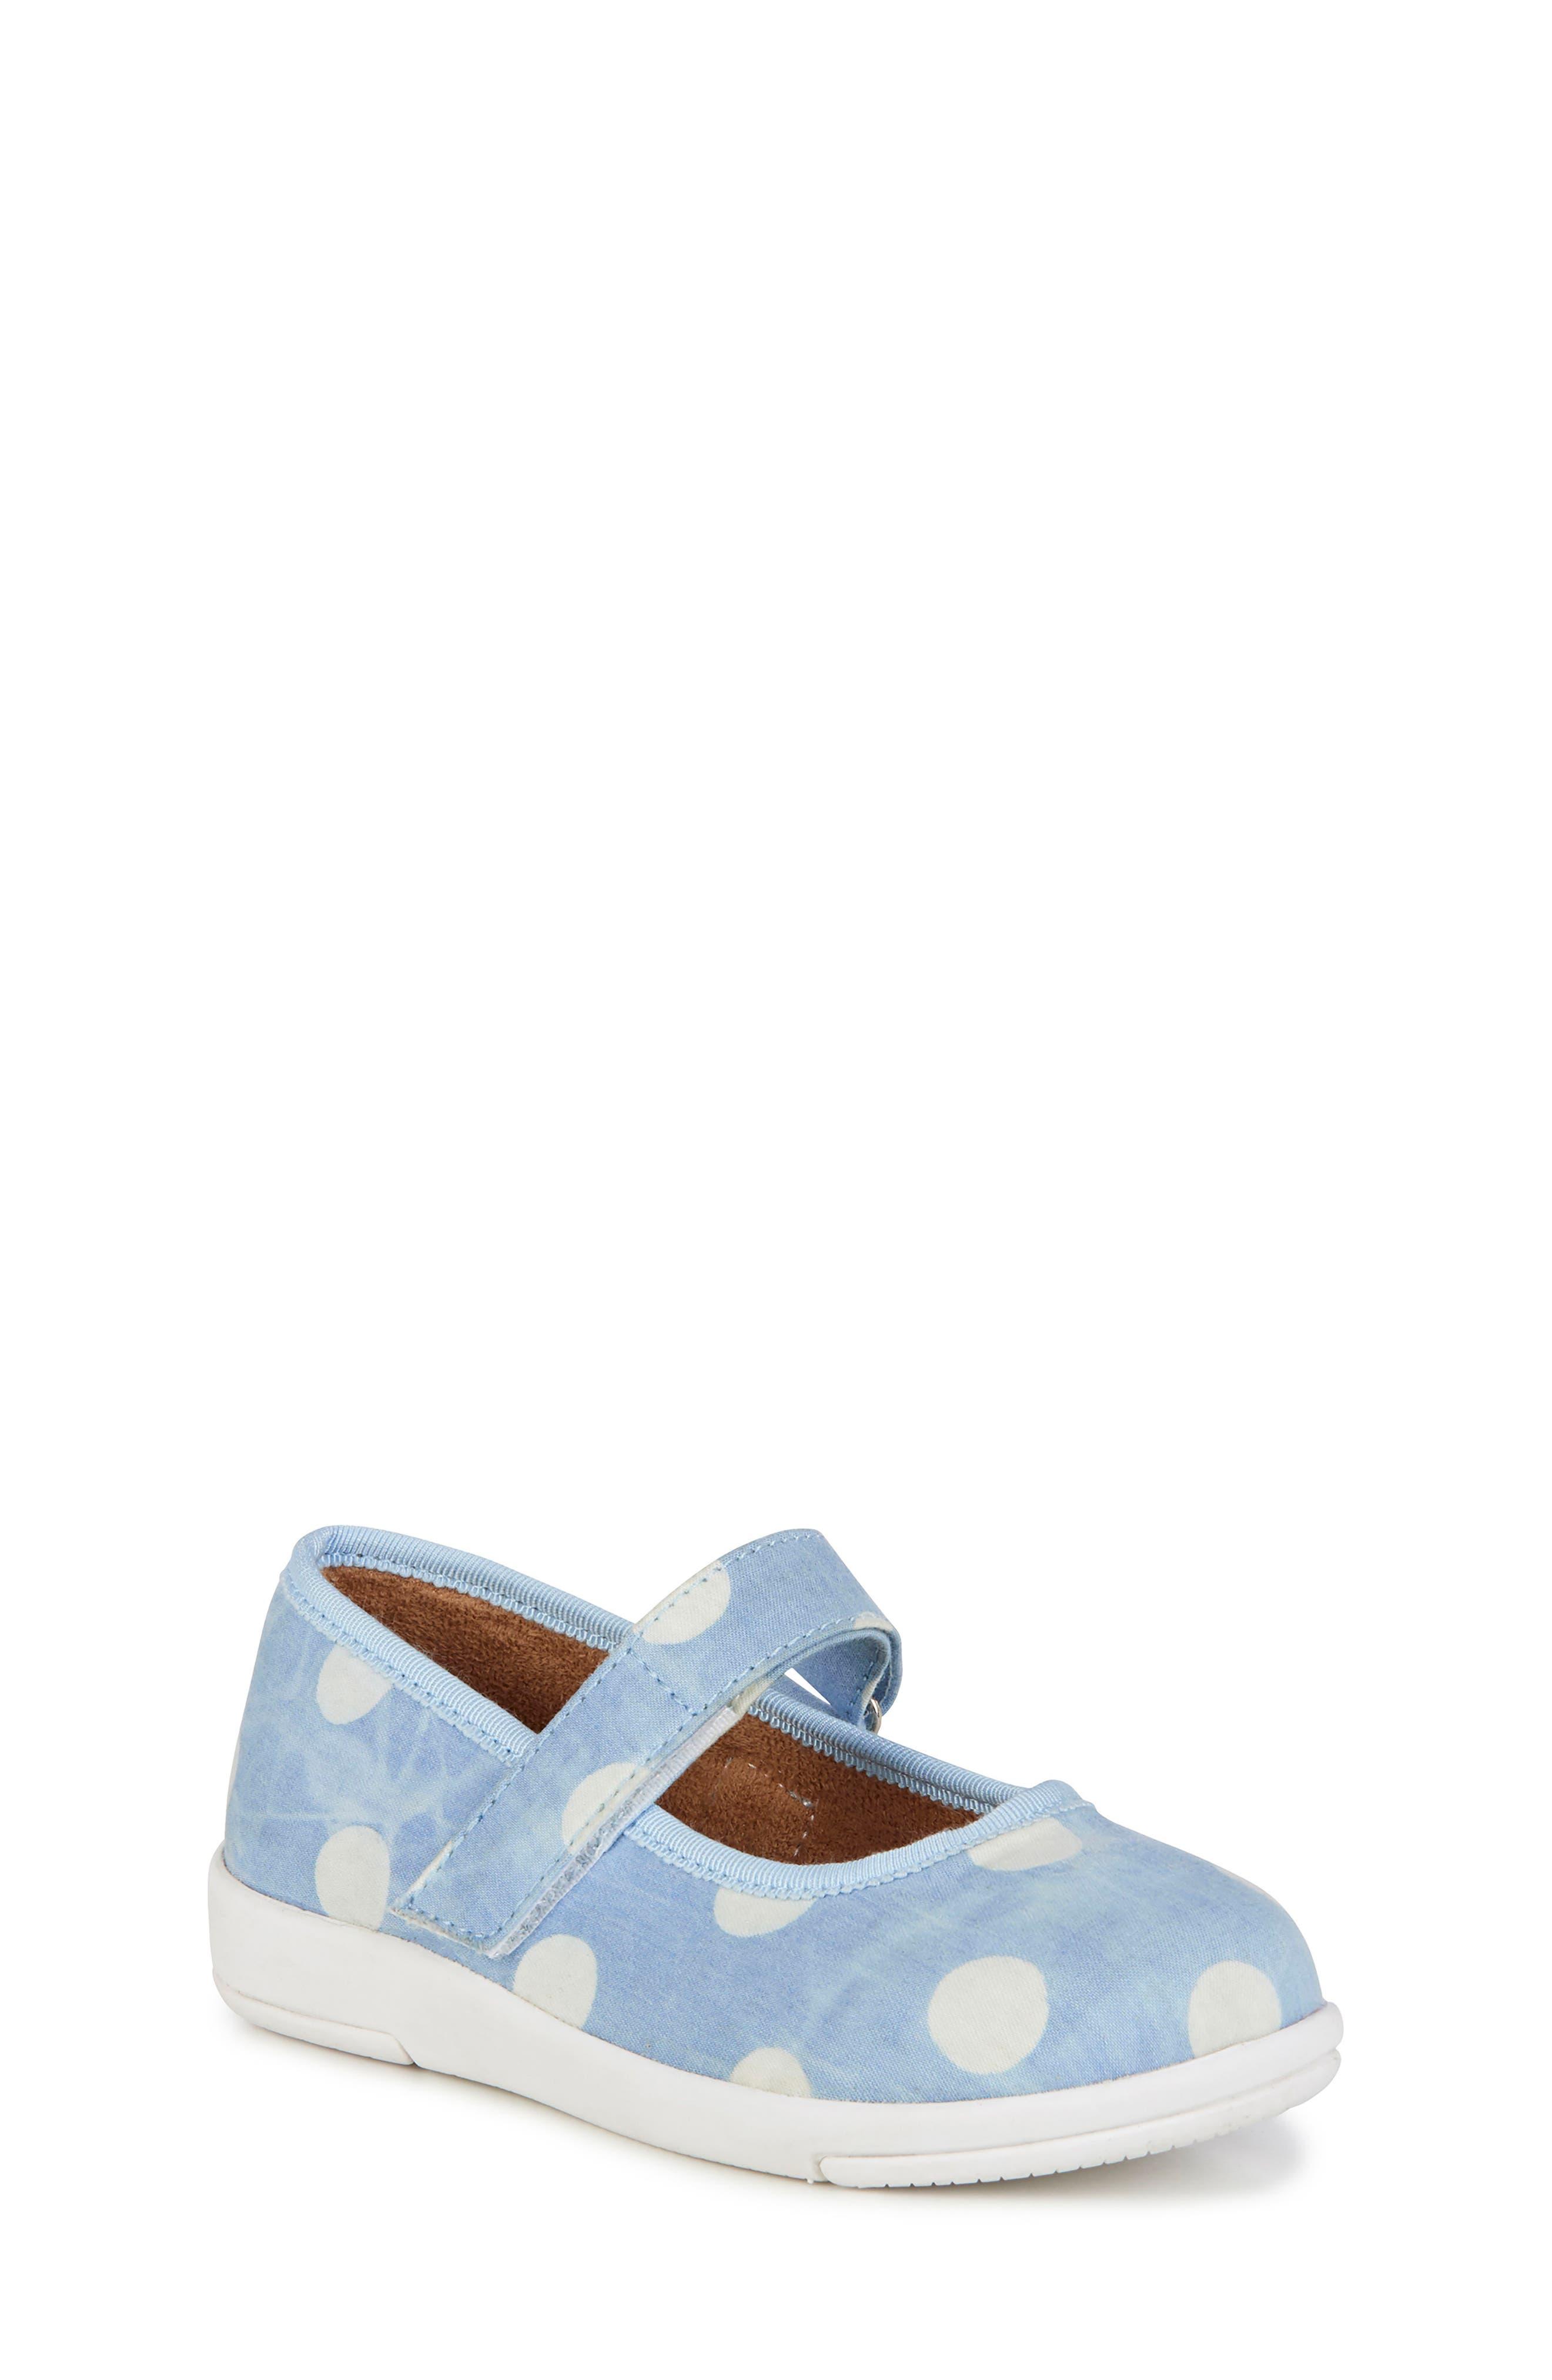 Girls Emu Australia Deena Mary Jane Sneaker Size 13 M  Blue